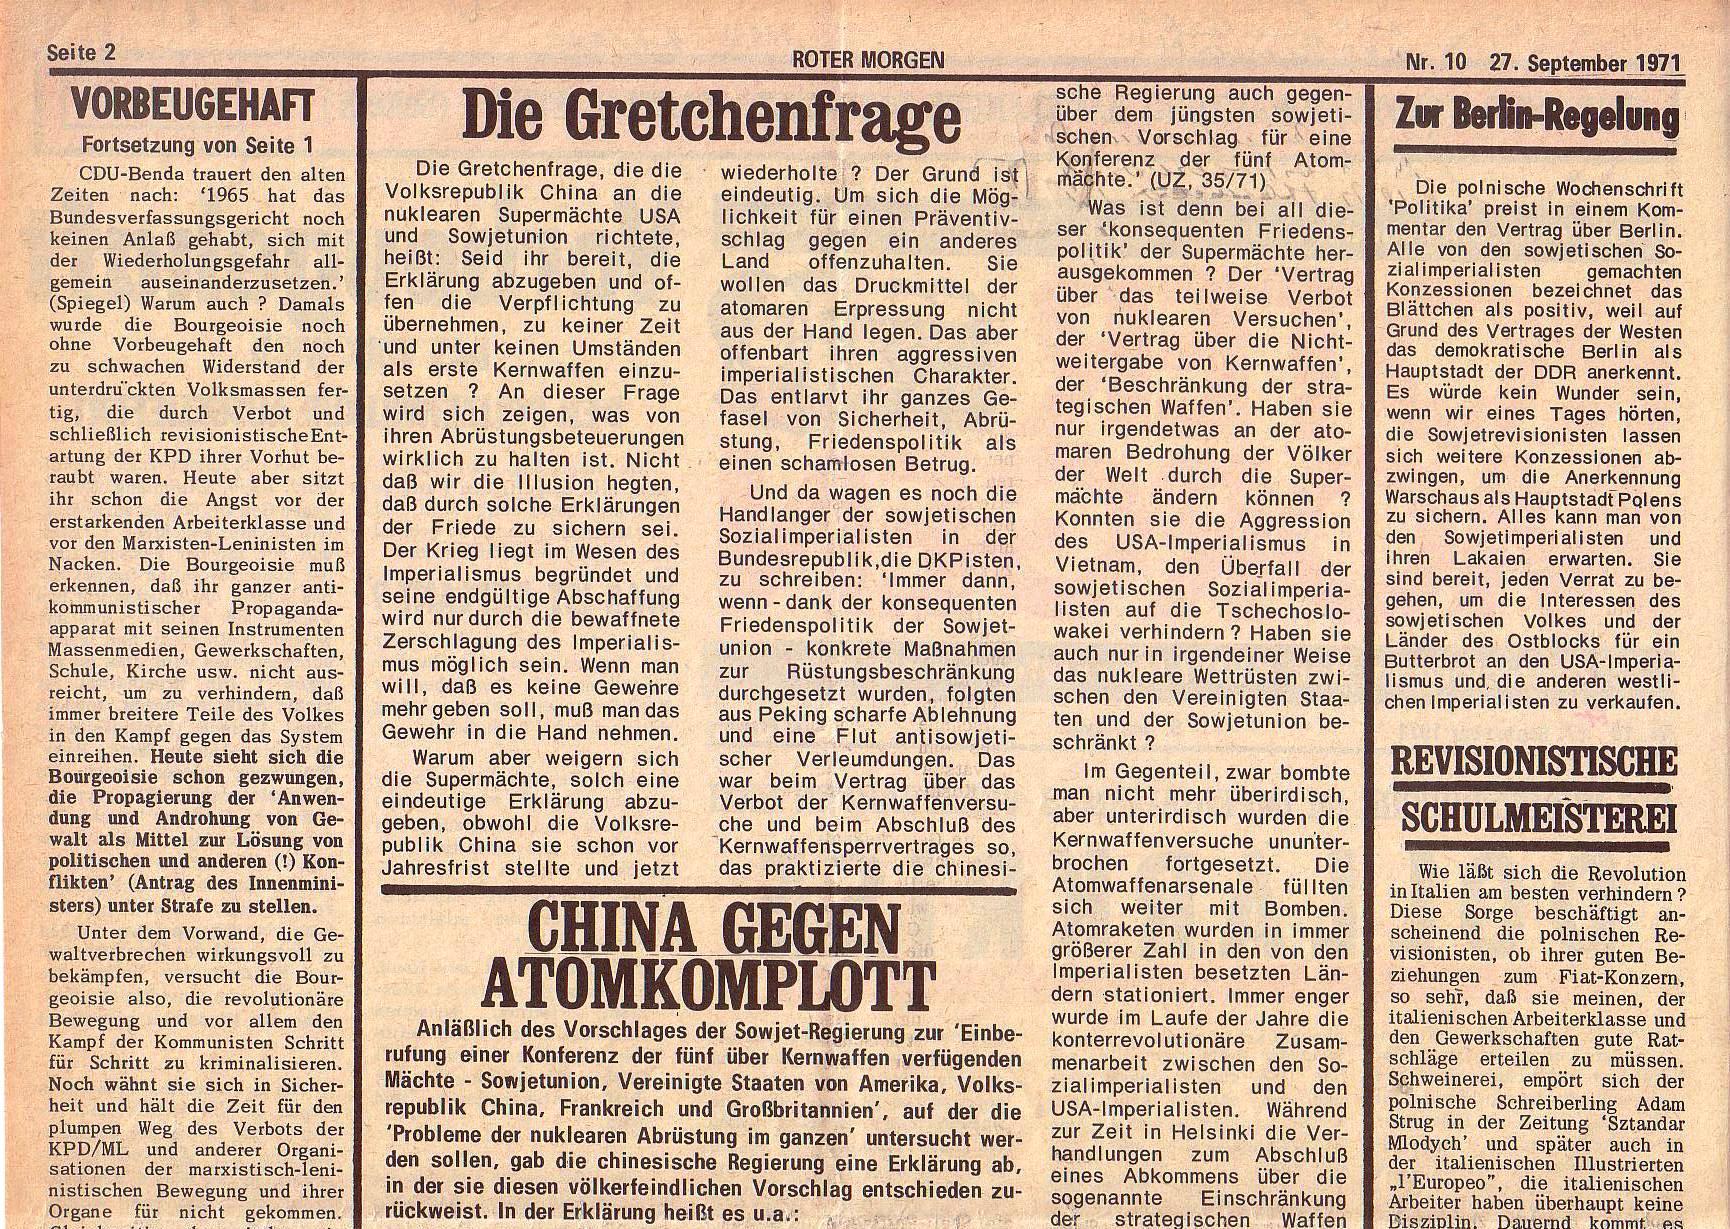 Roter Morgen, 5. Jg., 27. September 1971, Nr. 10, Seite 2a